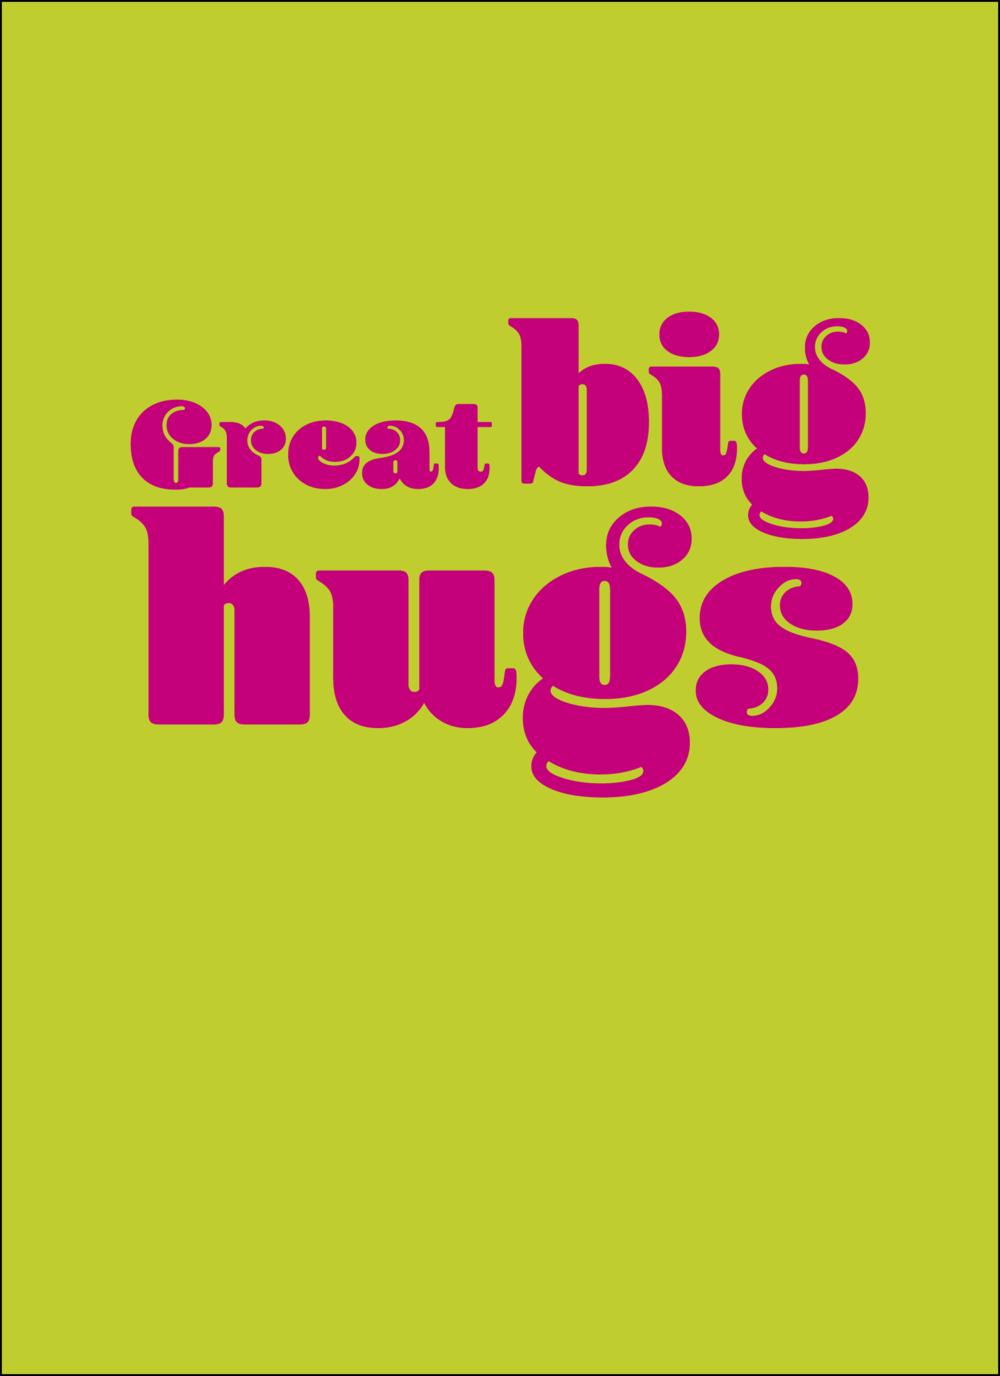 bighugs-01.png